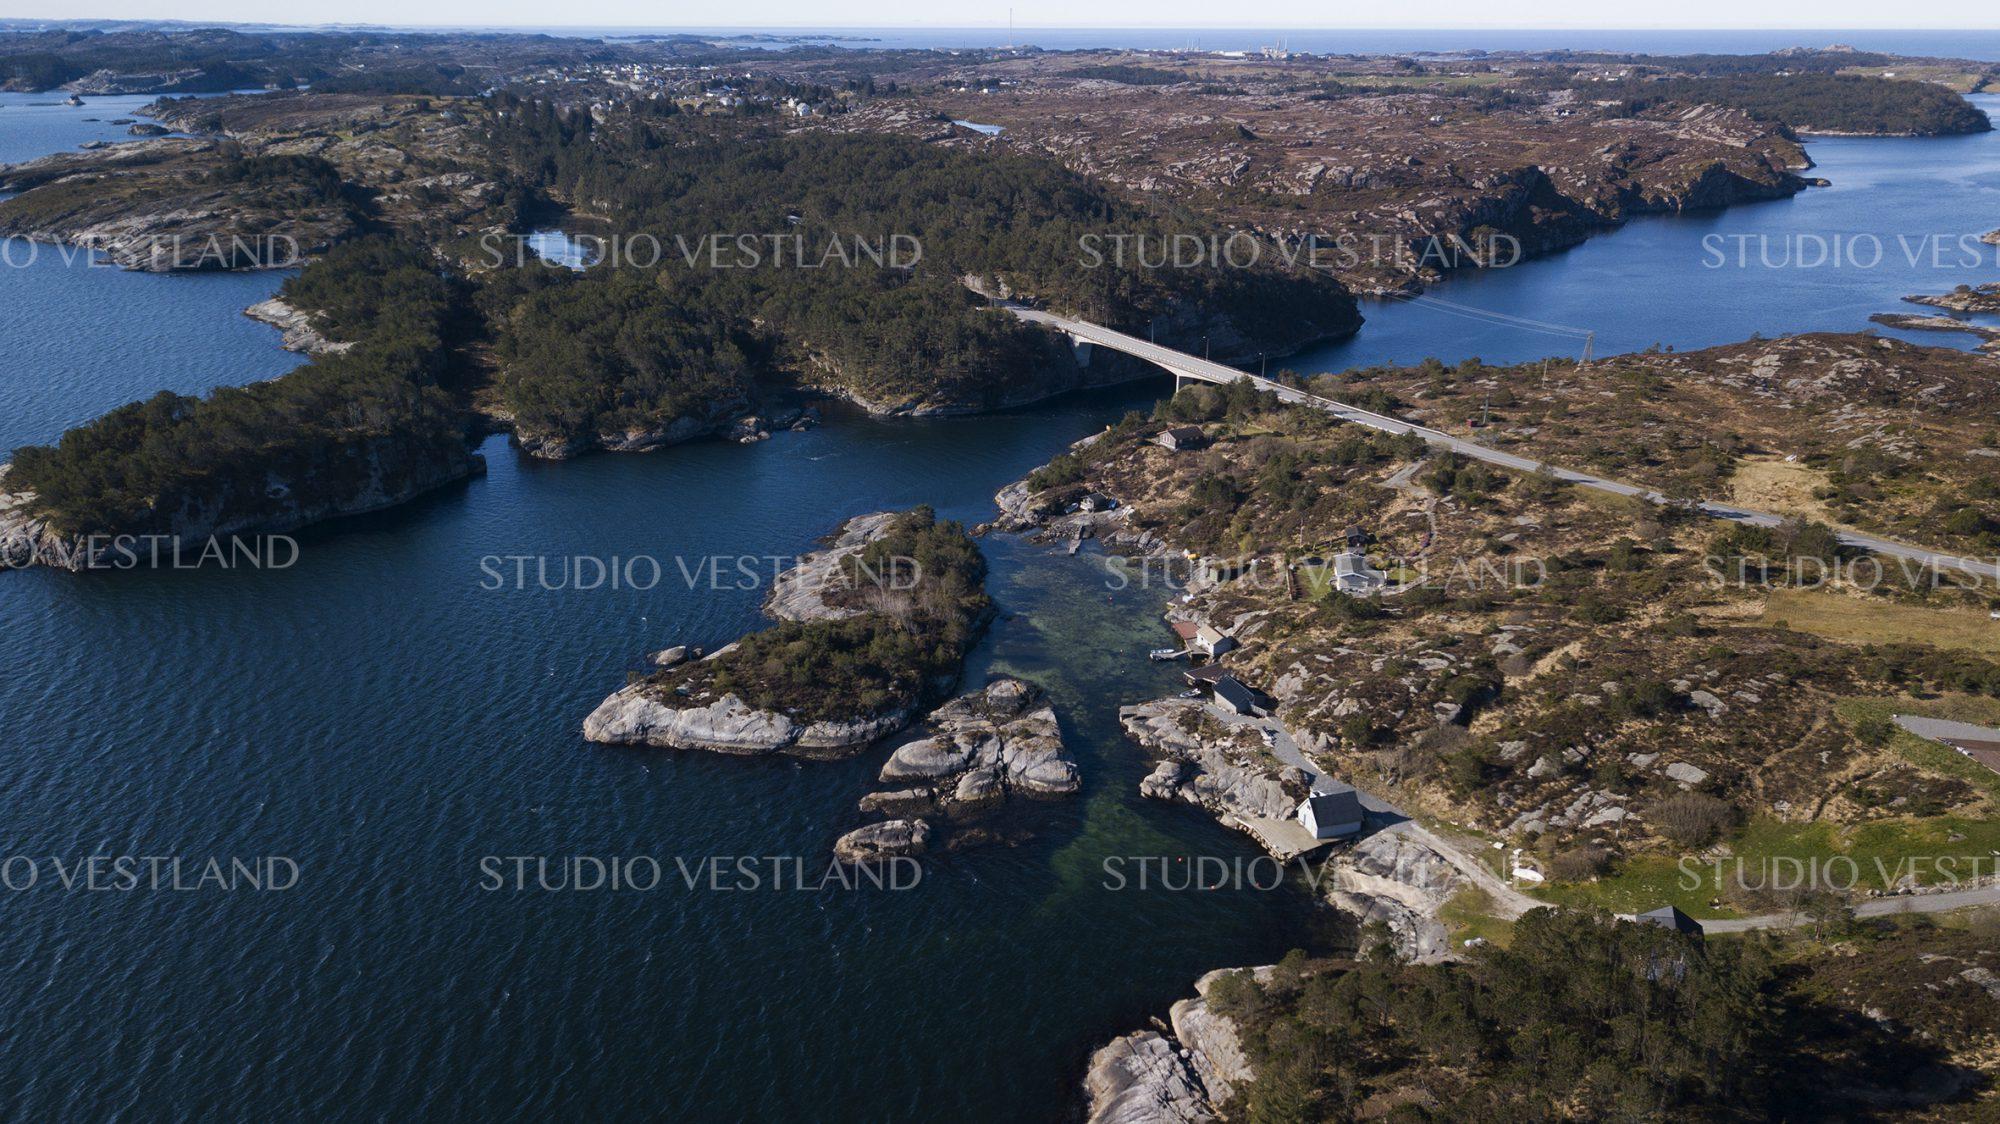 Studio Vestland - Øygarden 26